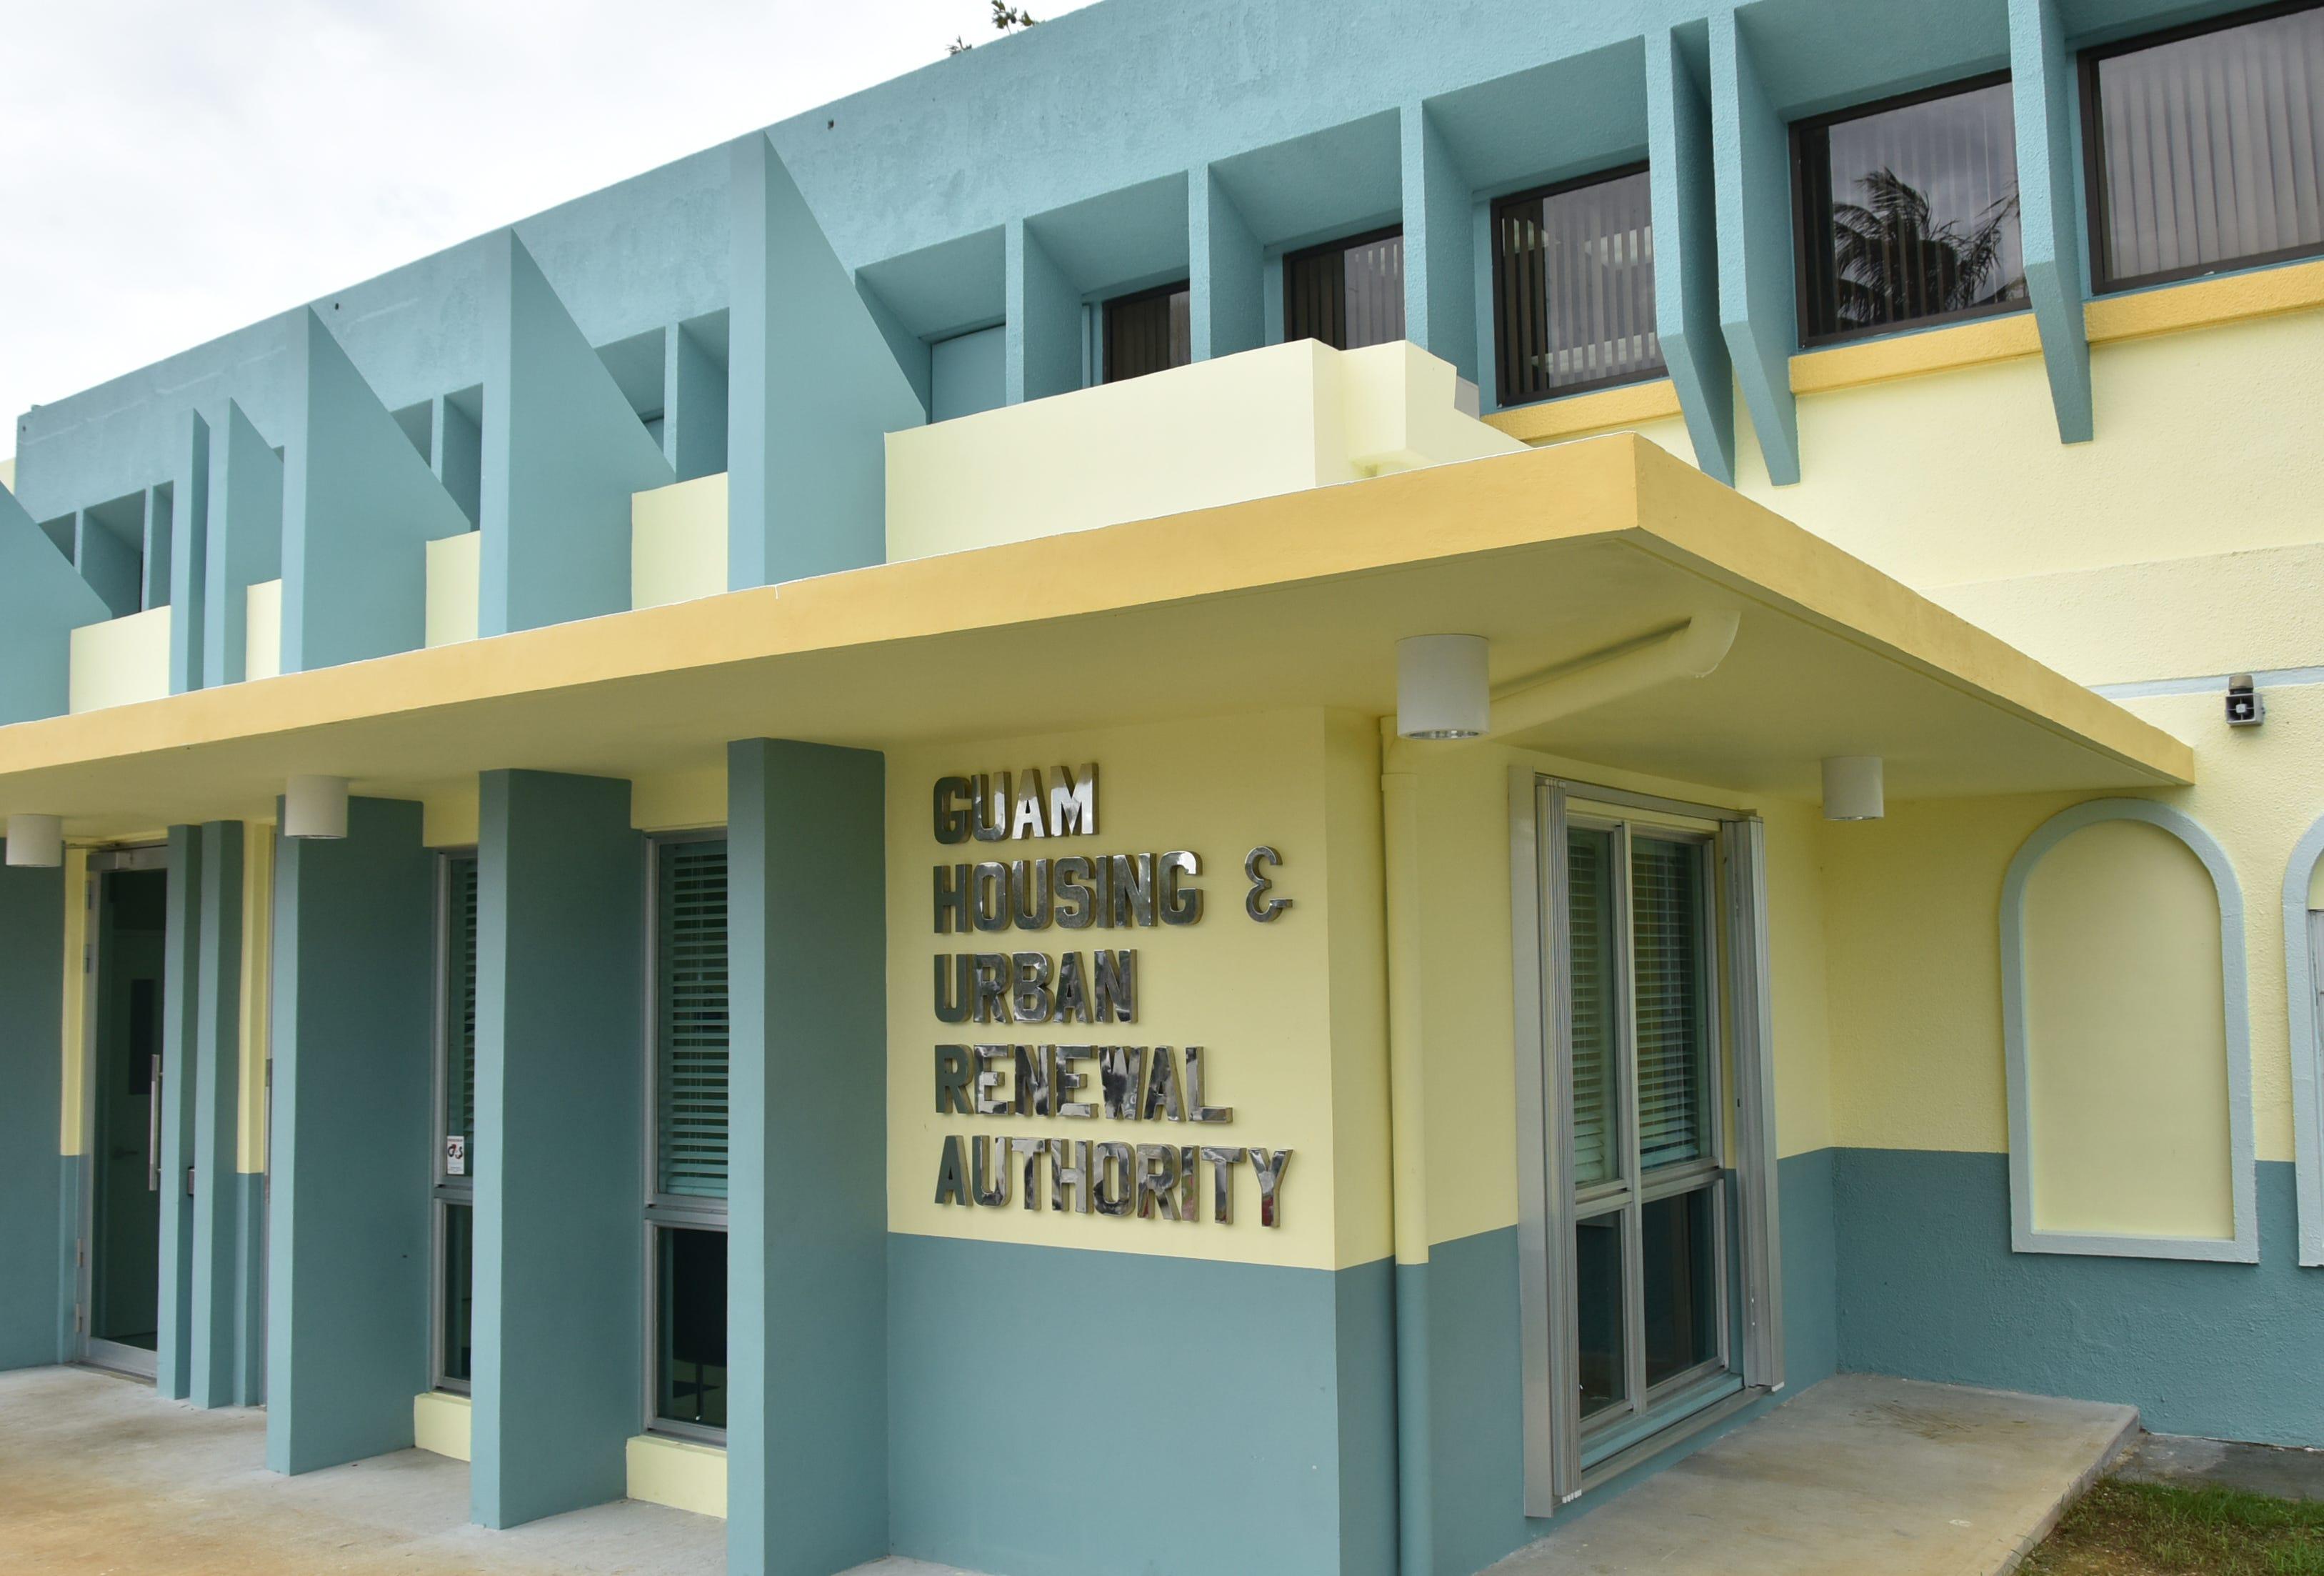 The Guam Housing and Urban Renewal Authority office in Sinajana.